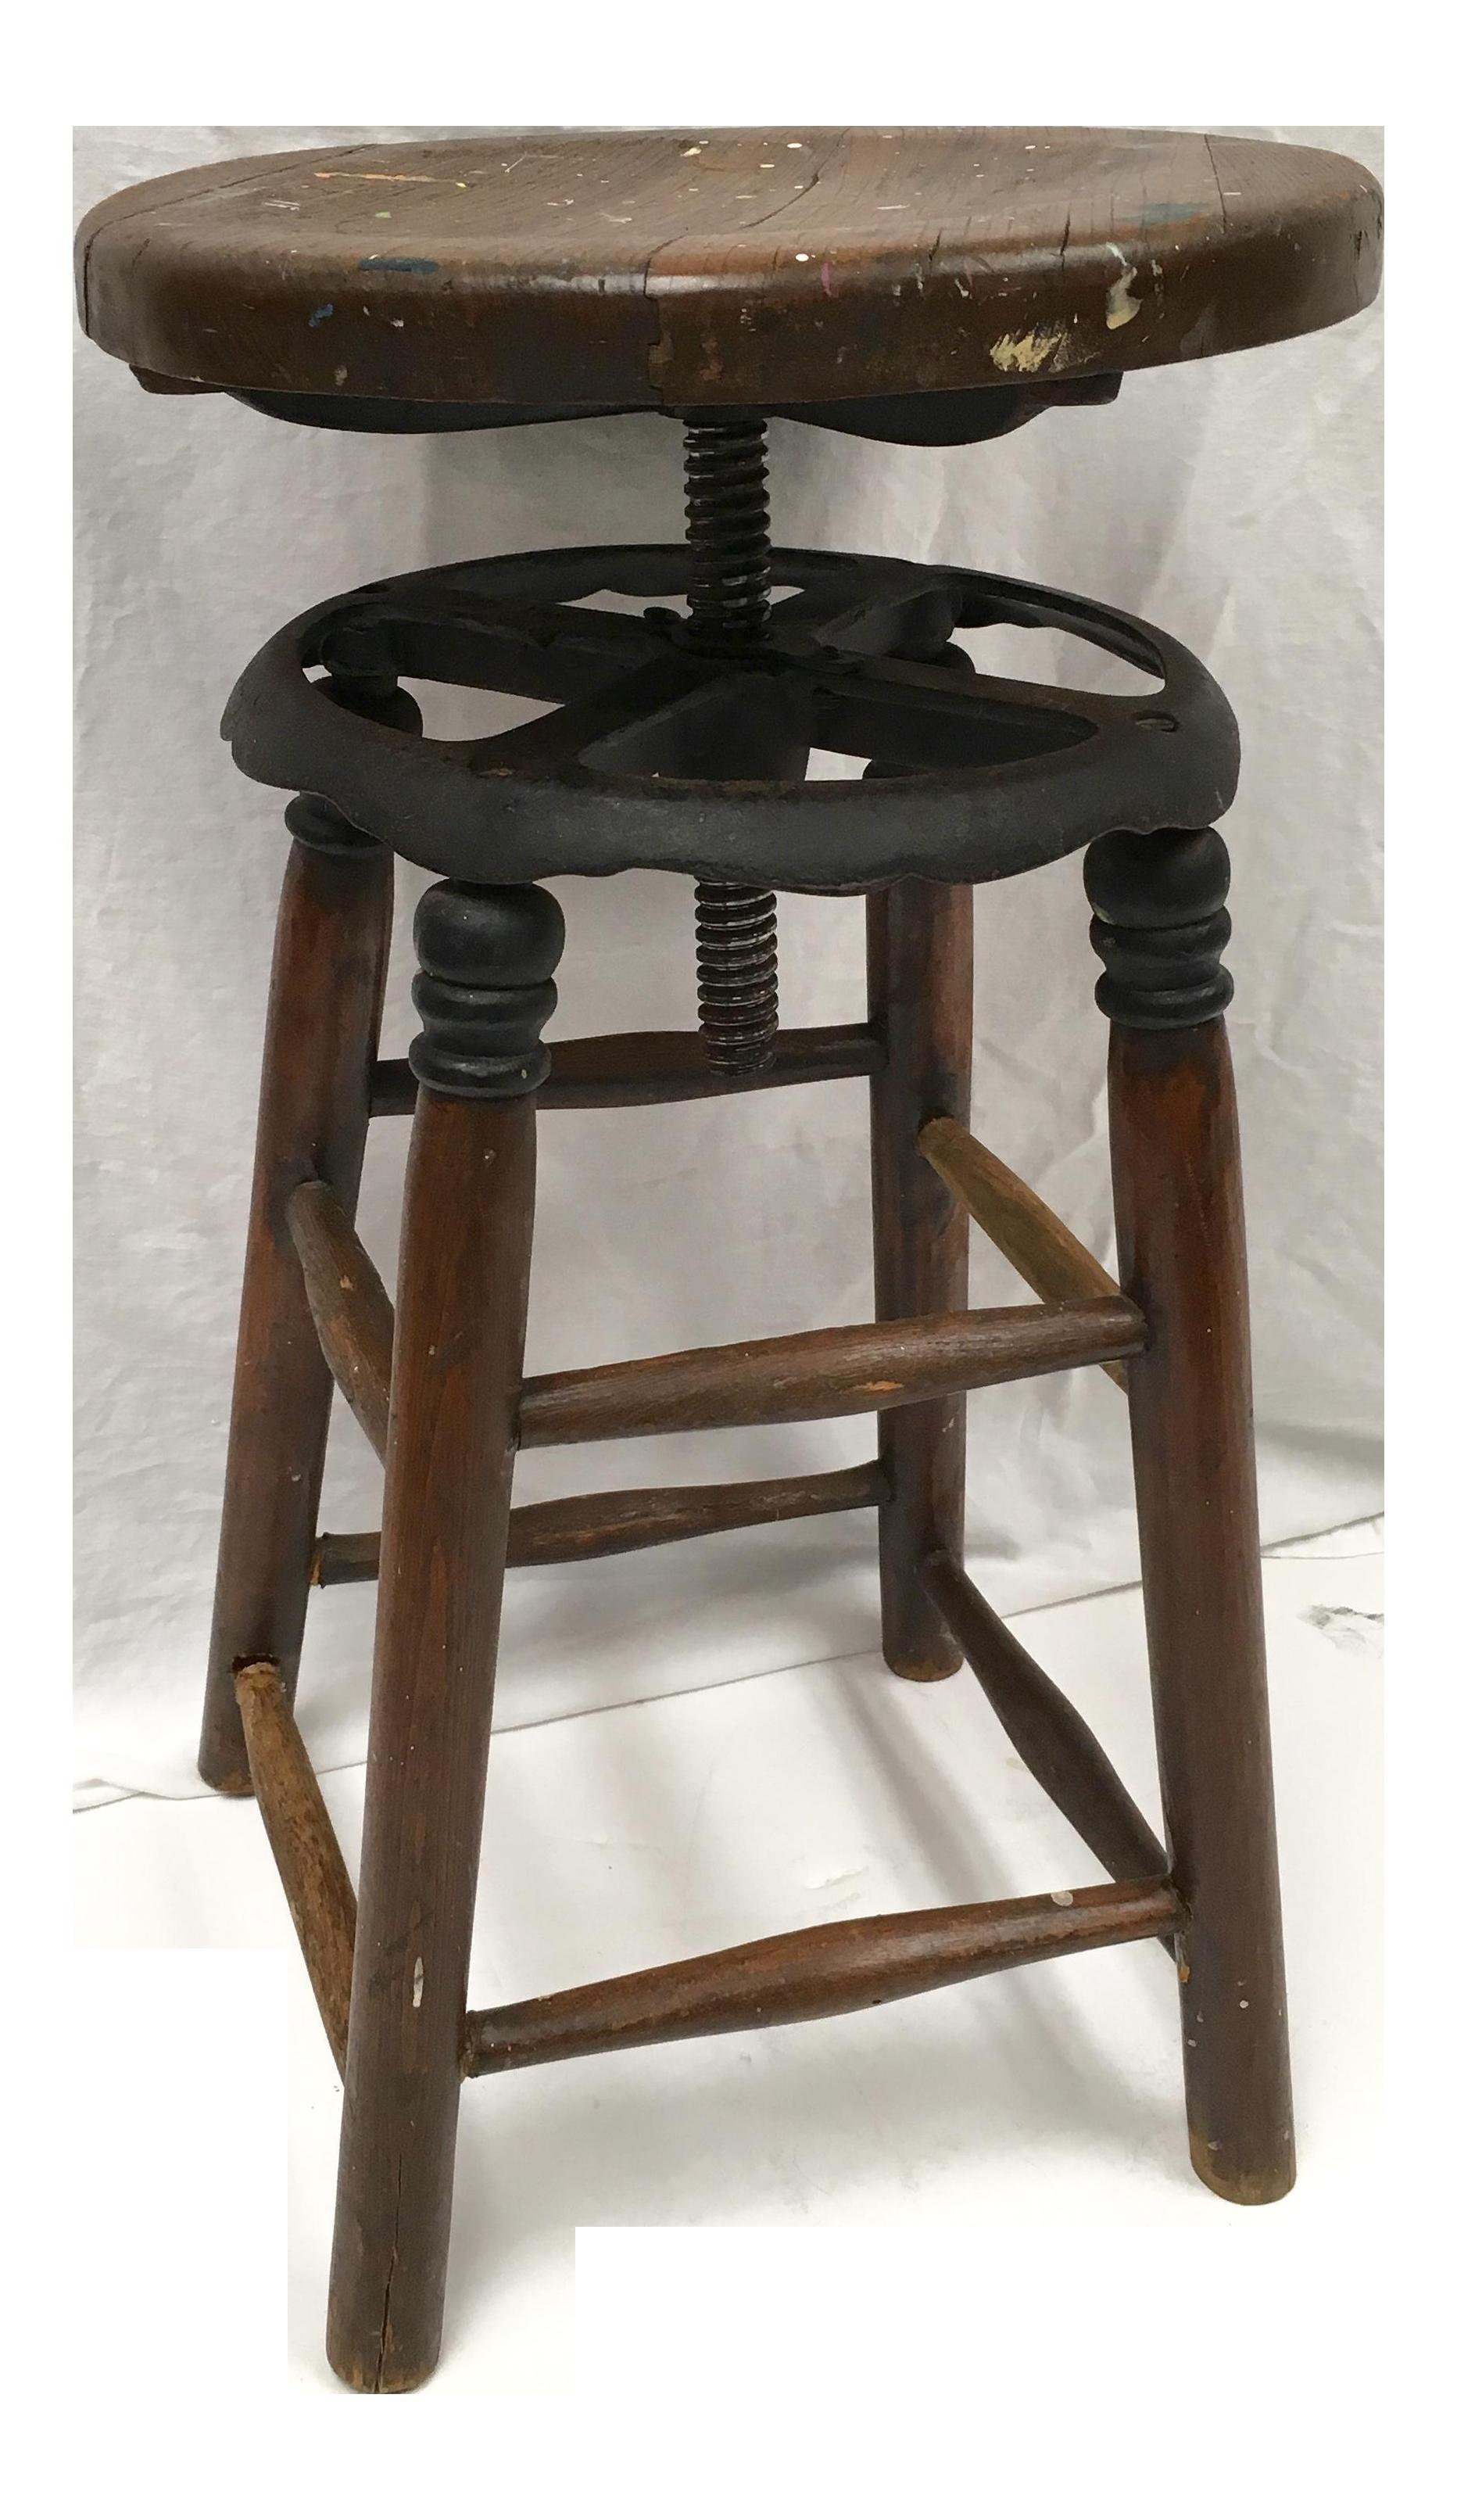 Vintage Industrial Wood u0026 Iron Swivel Painteru0027s Stool - Image ...  sc 1 st  Chairish & Vintage Industrial Wood u0026 Iron Swivel Painteru0027s Stool | Chairish islam-shia.org